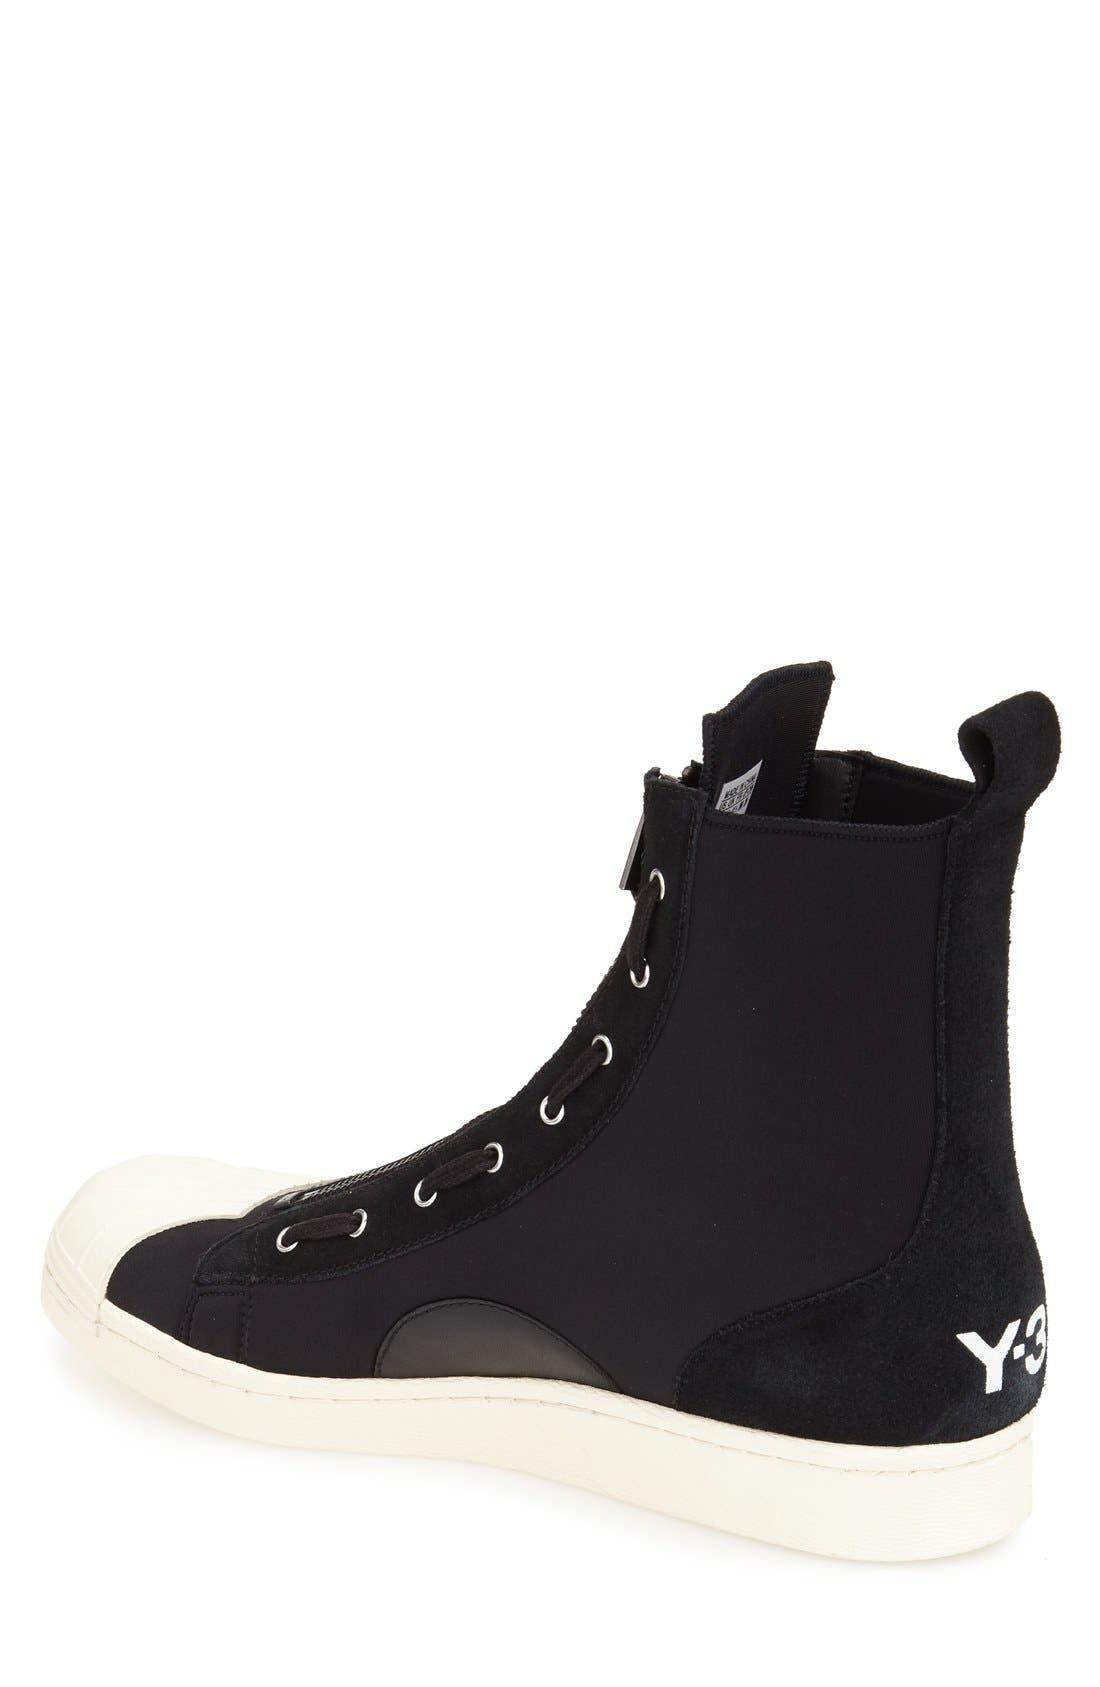 'Pro' High Top Sneaker,                             Alternate thumbnail 2, color,                             002